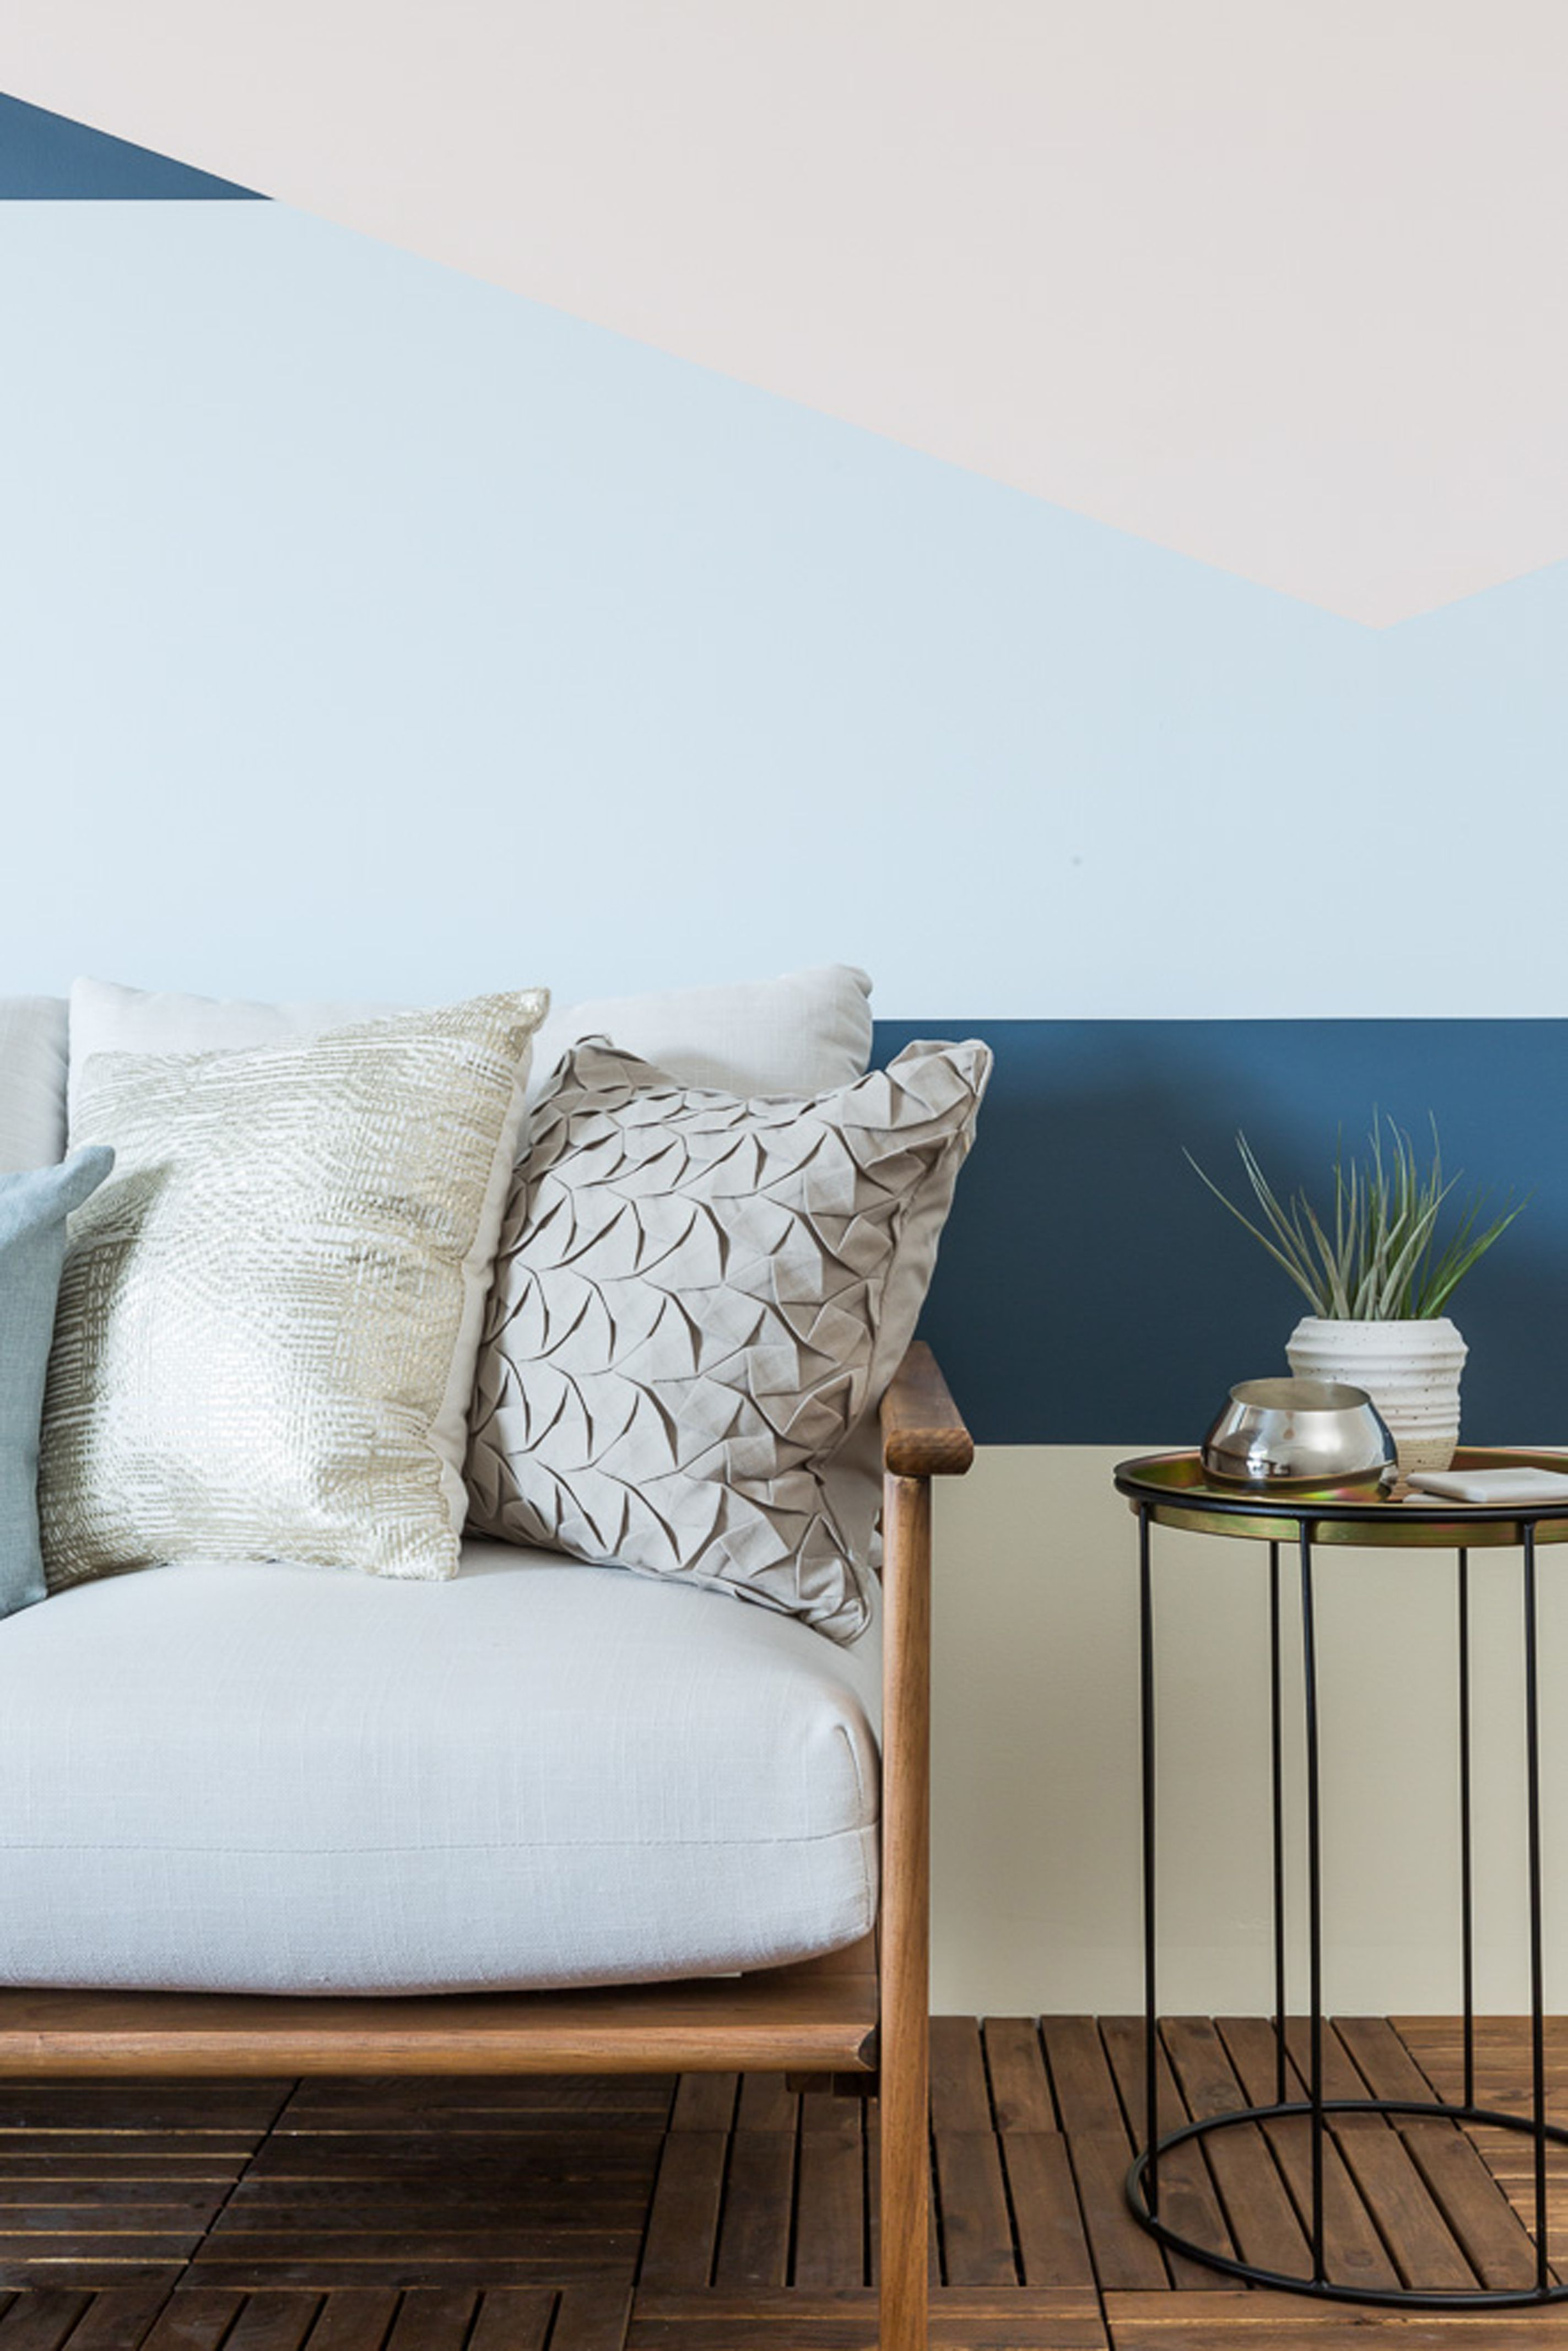 Sephora, Color Blocking, Patio, Accents, Sidetable, Sofa, Teak, Wood